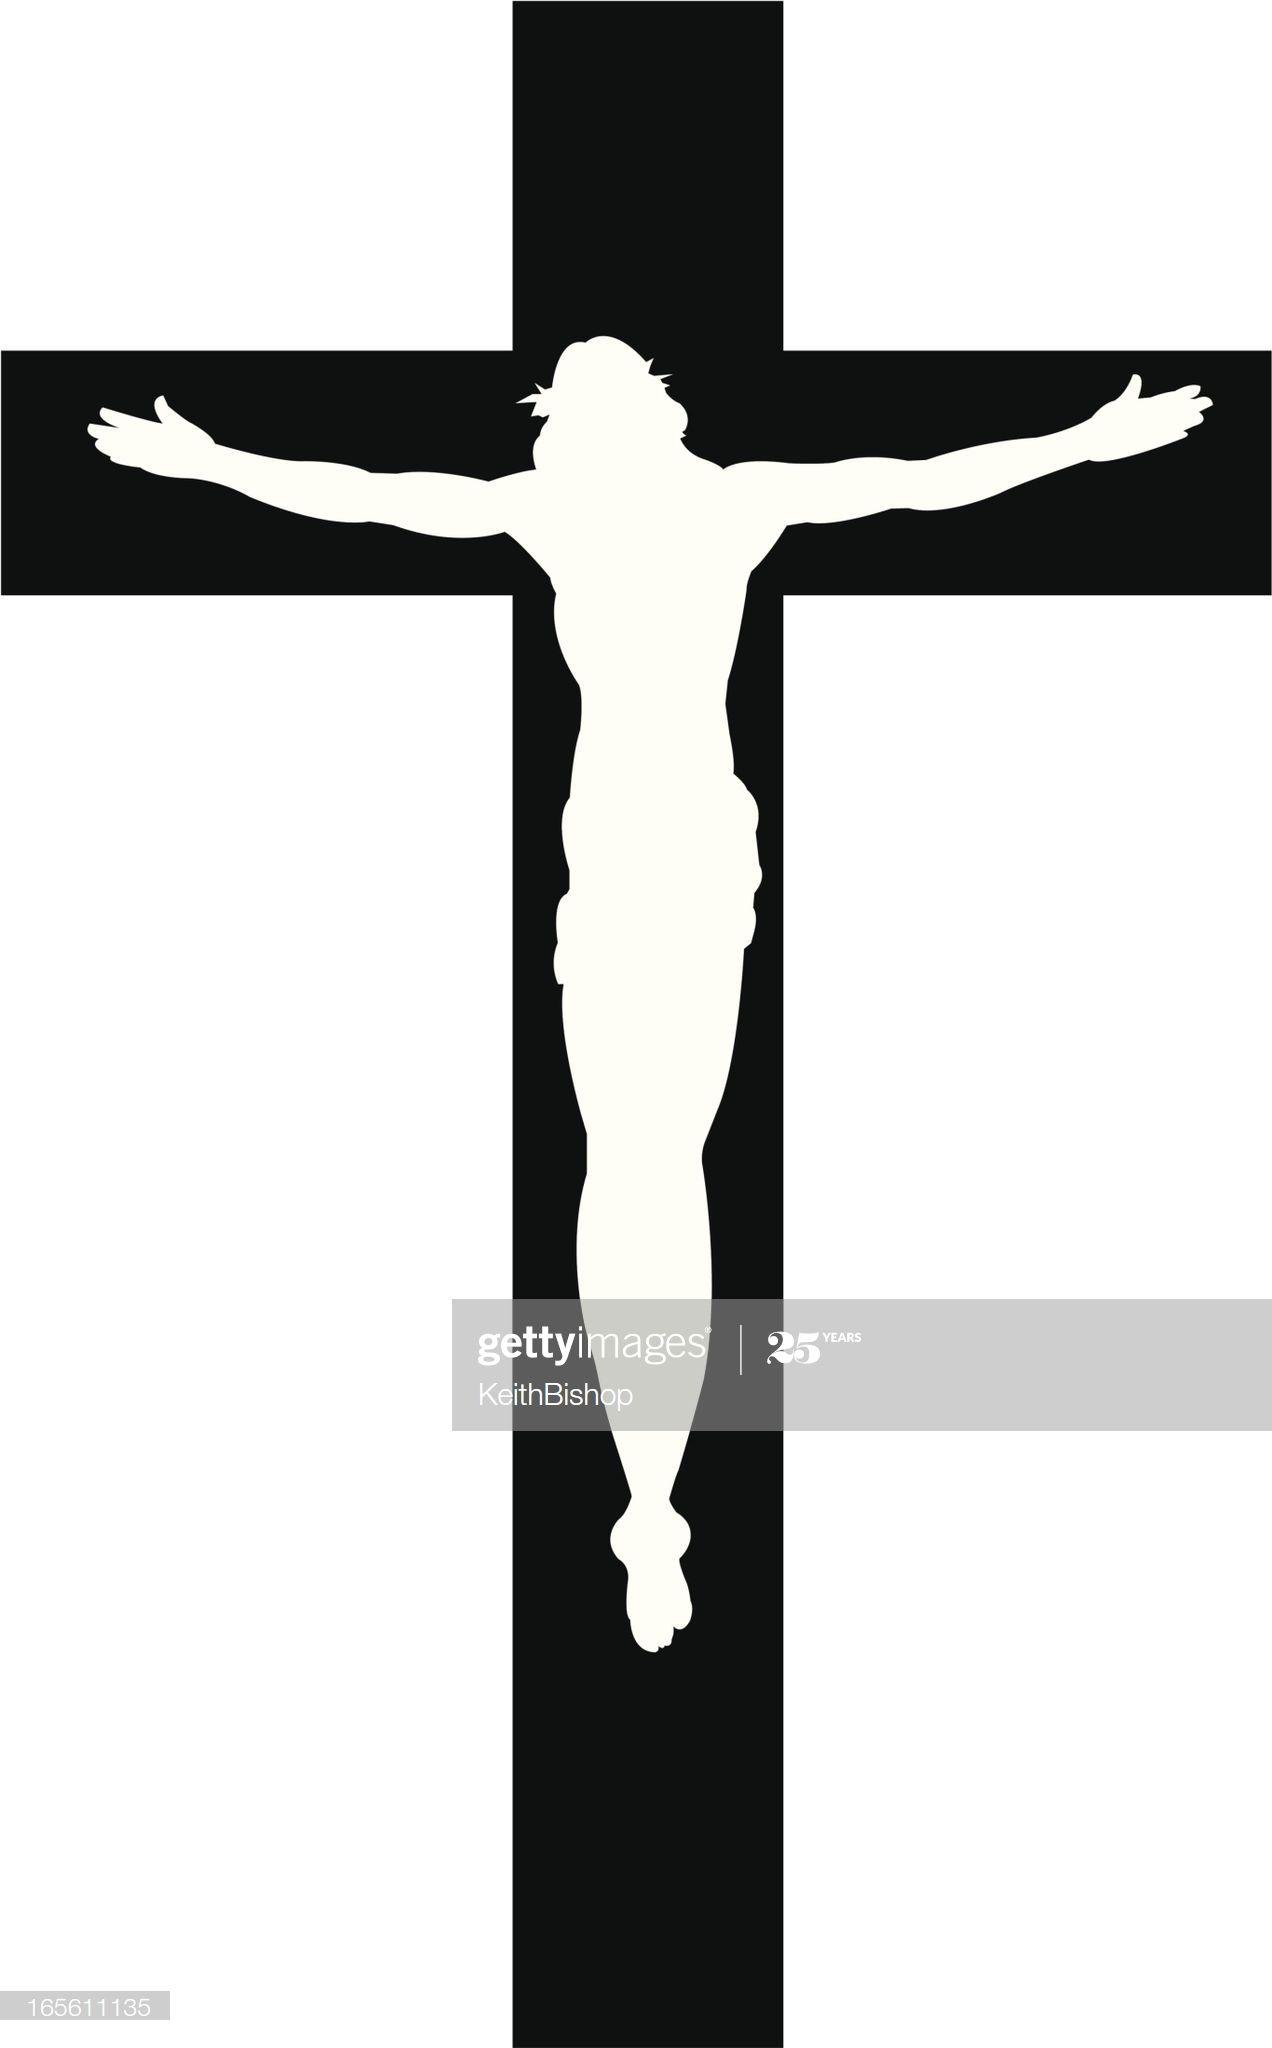 Ilustracion De Stock Cruce De Jesus Christ Cristian Religion Silueta La Cruz De Jesus Cruz De Cristo Imagenes De Cruces